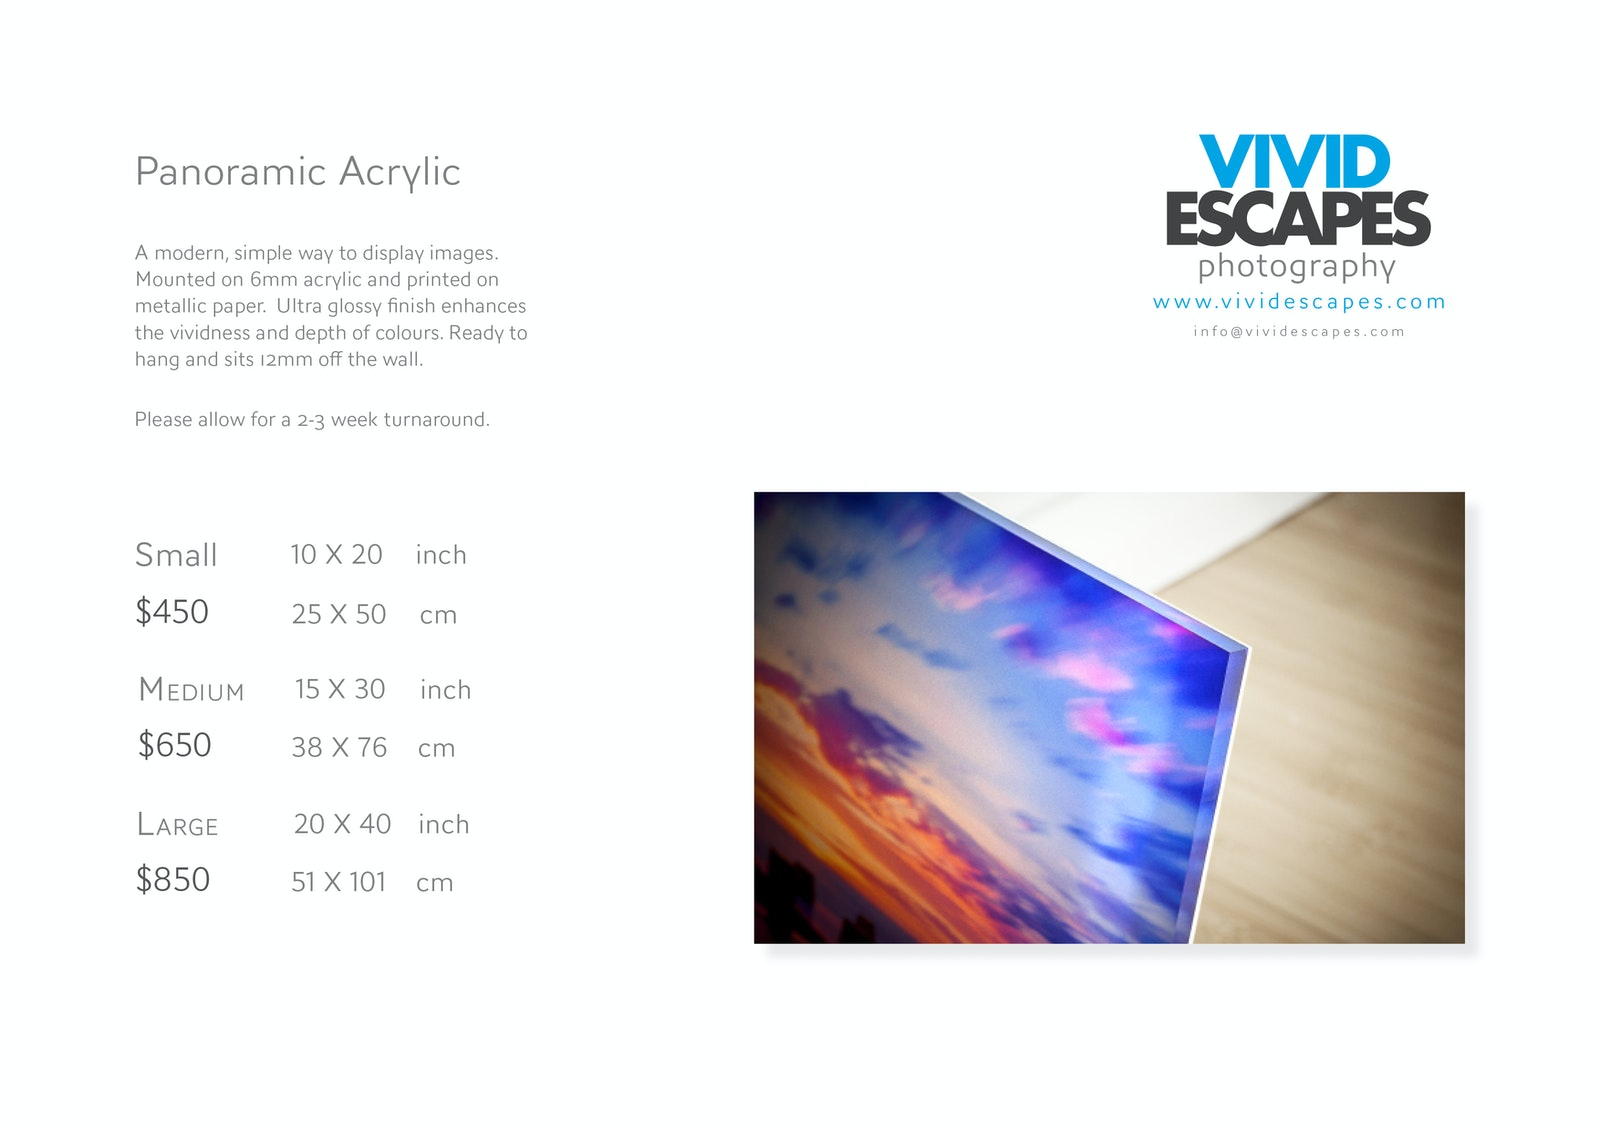 Vivid_Escapes_Price_List_NEW6